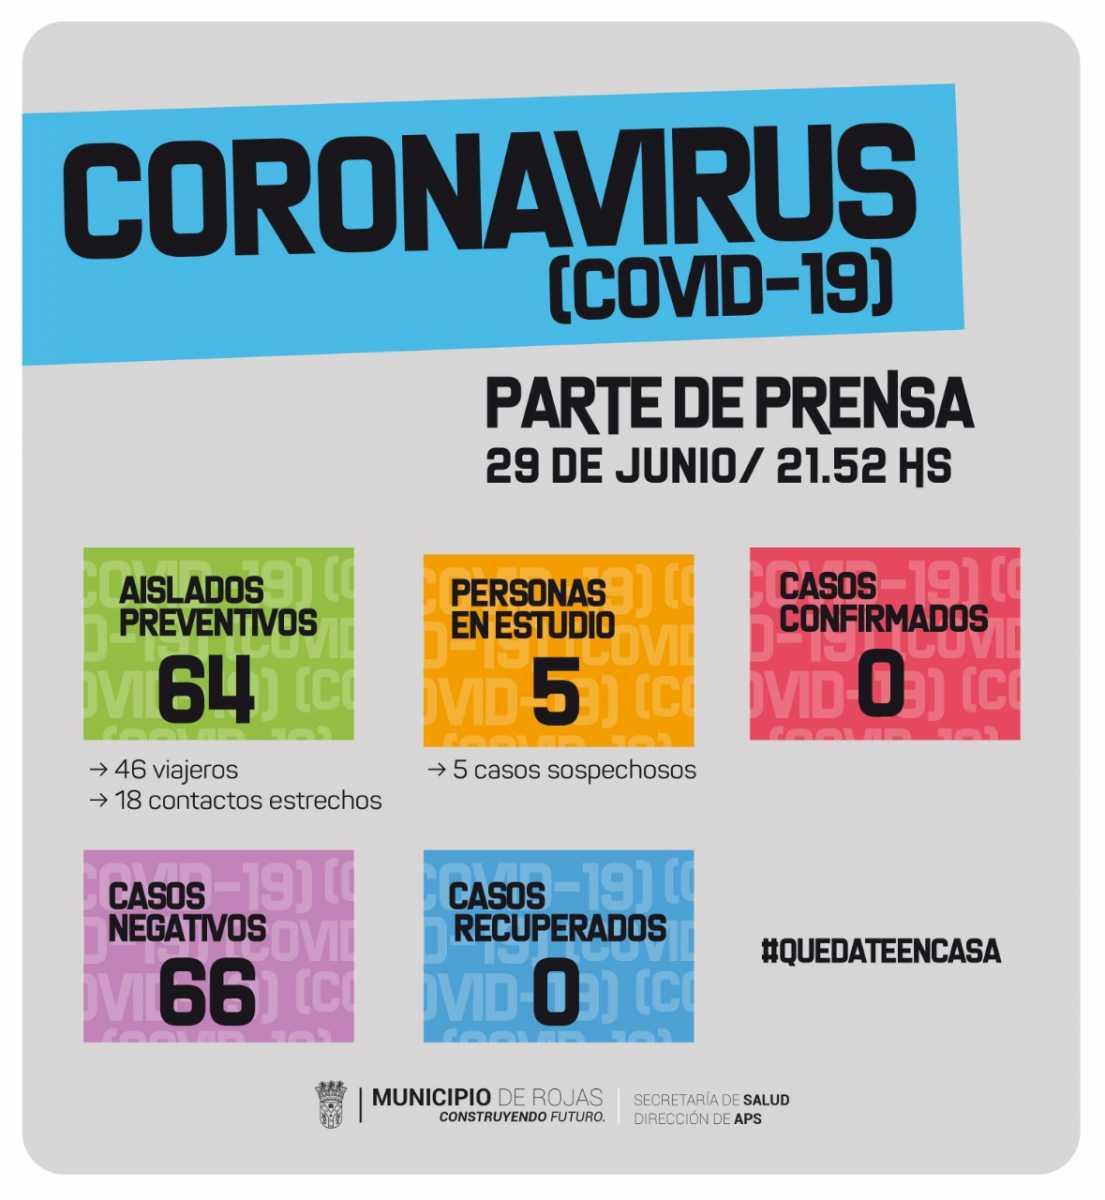 Covid 19: nuevo caso negativo; nuevo caso sospechoso